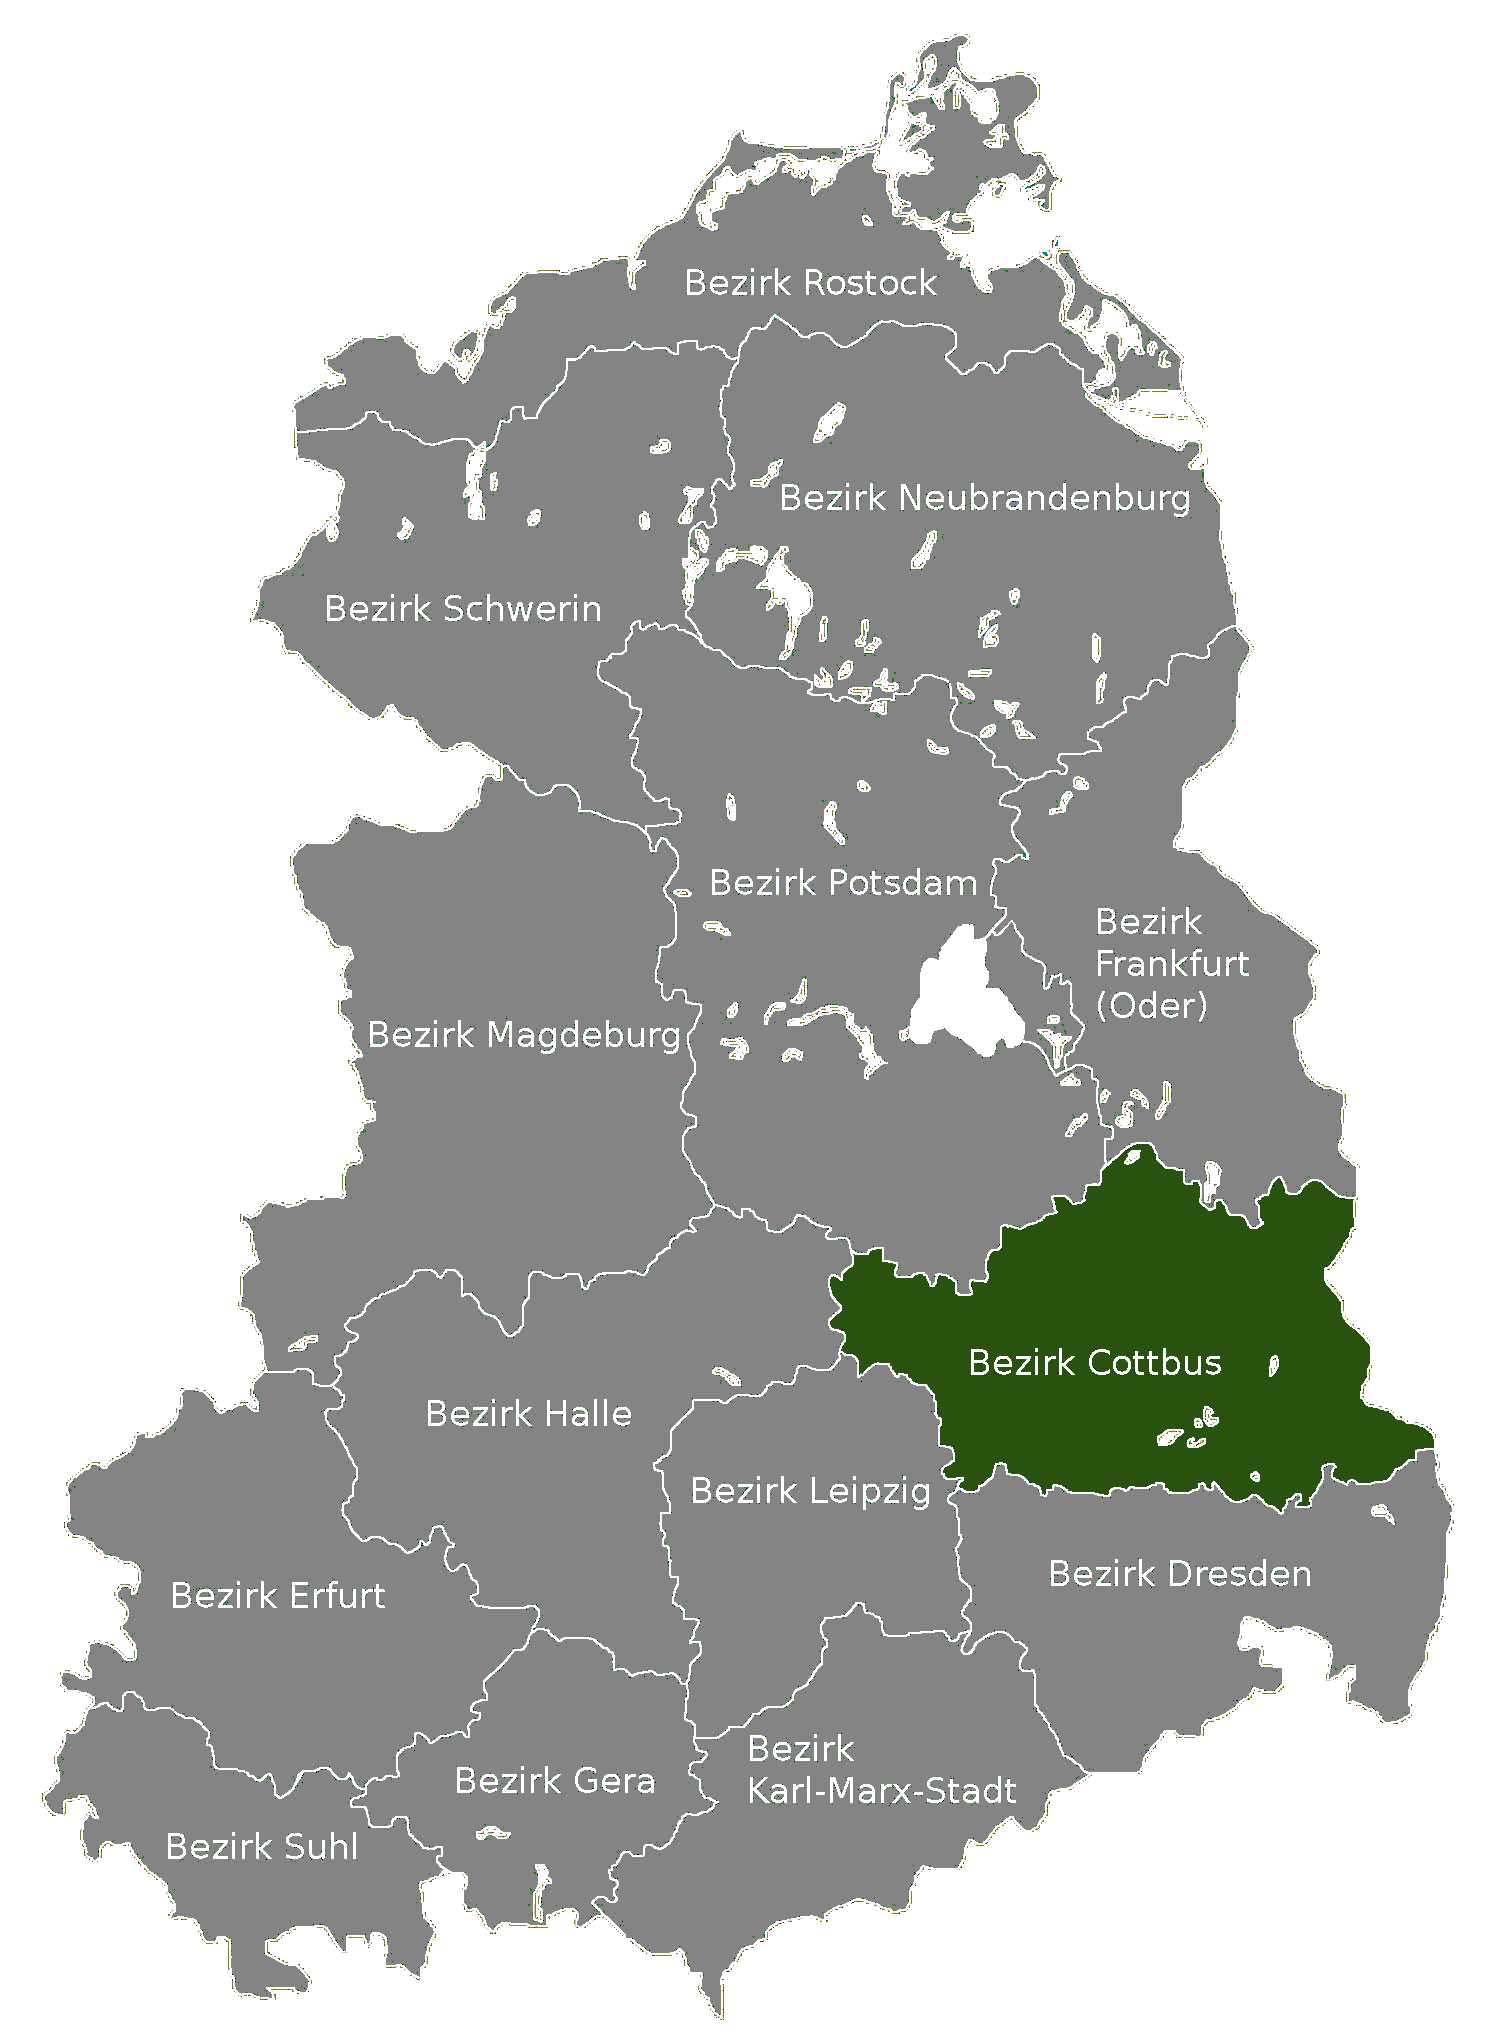 FileBezirk Cottbuspng Wikimedia Commons